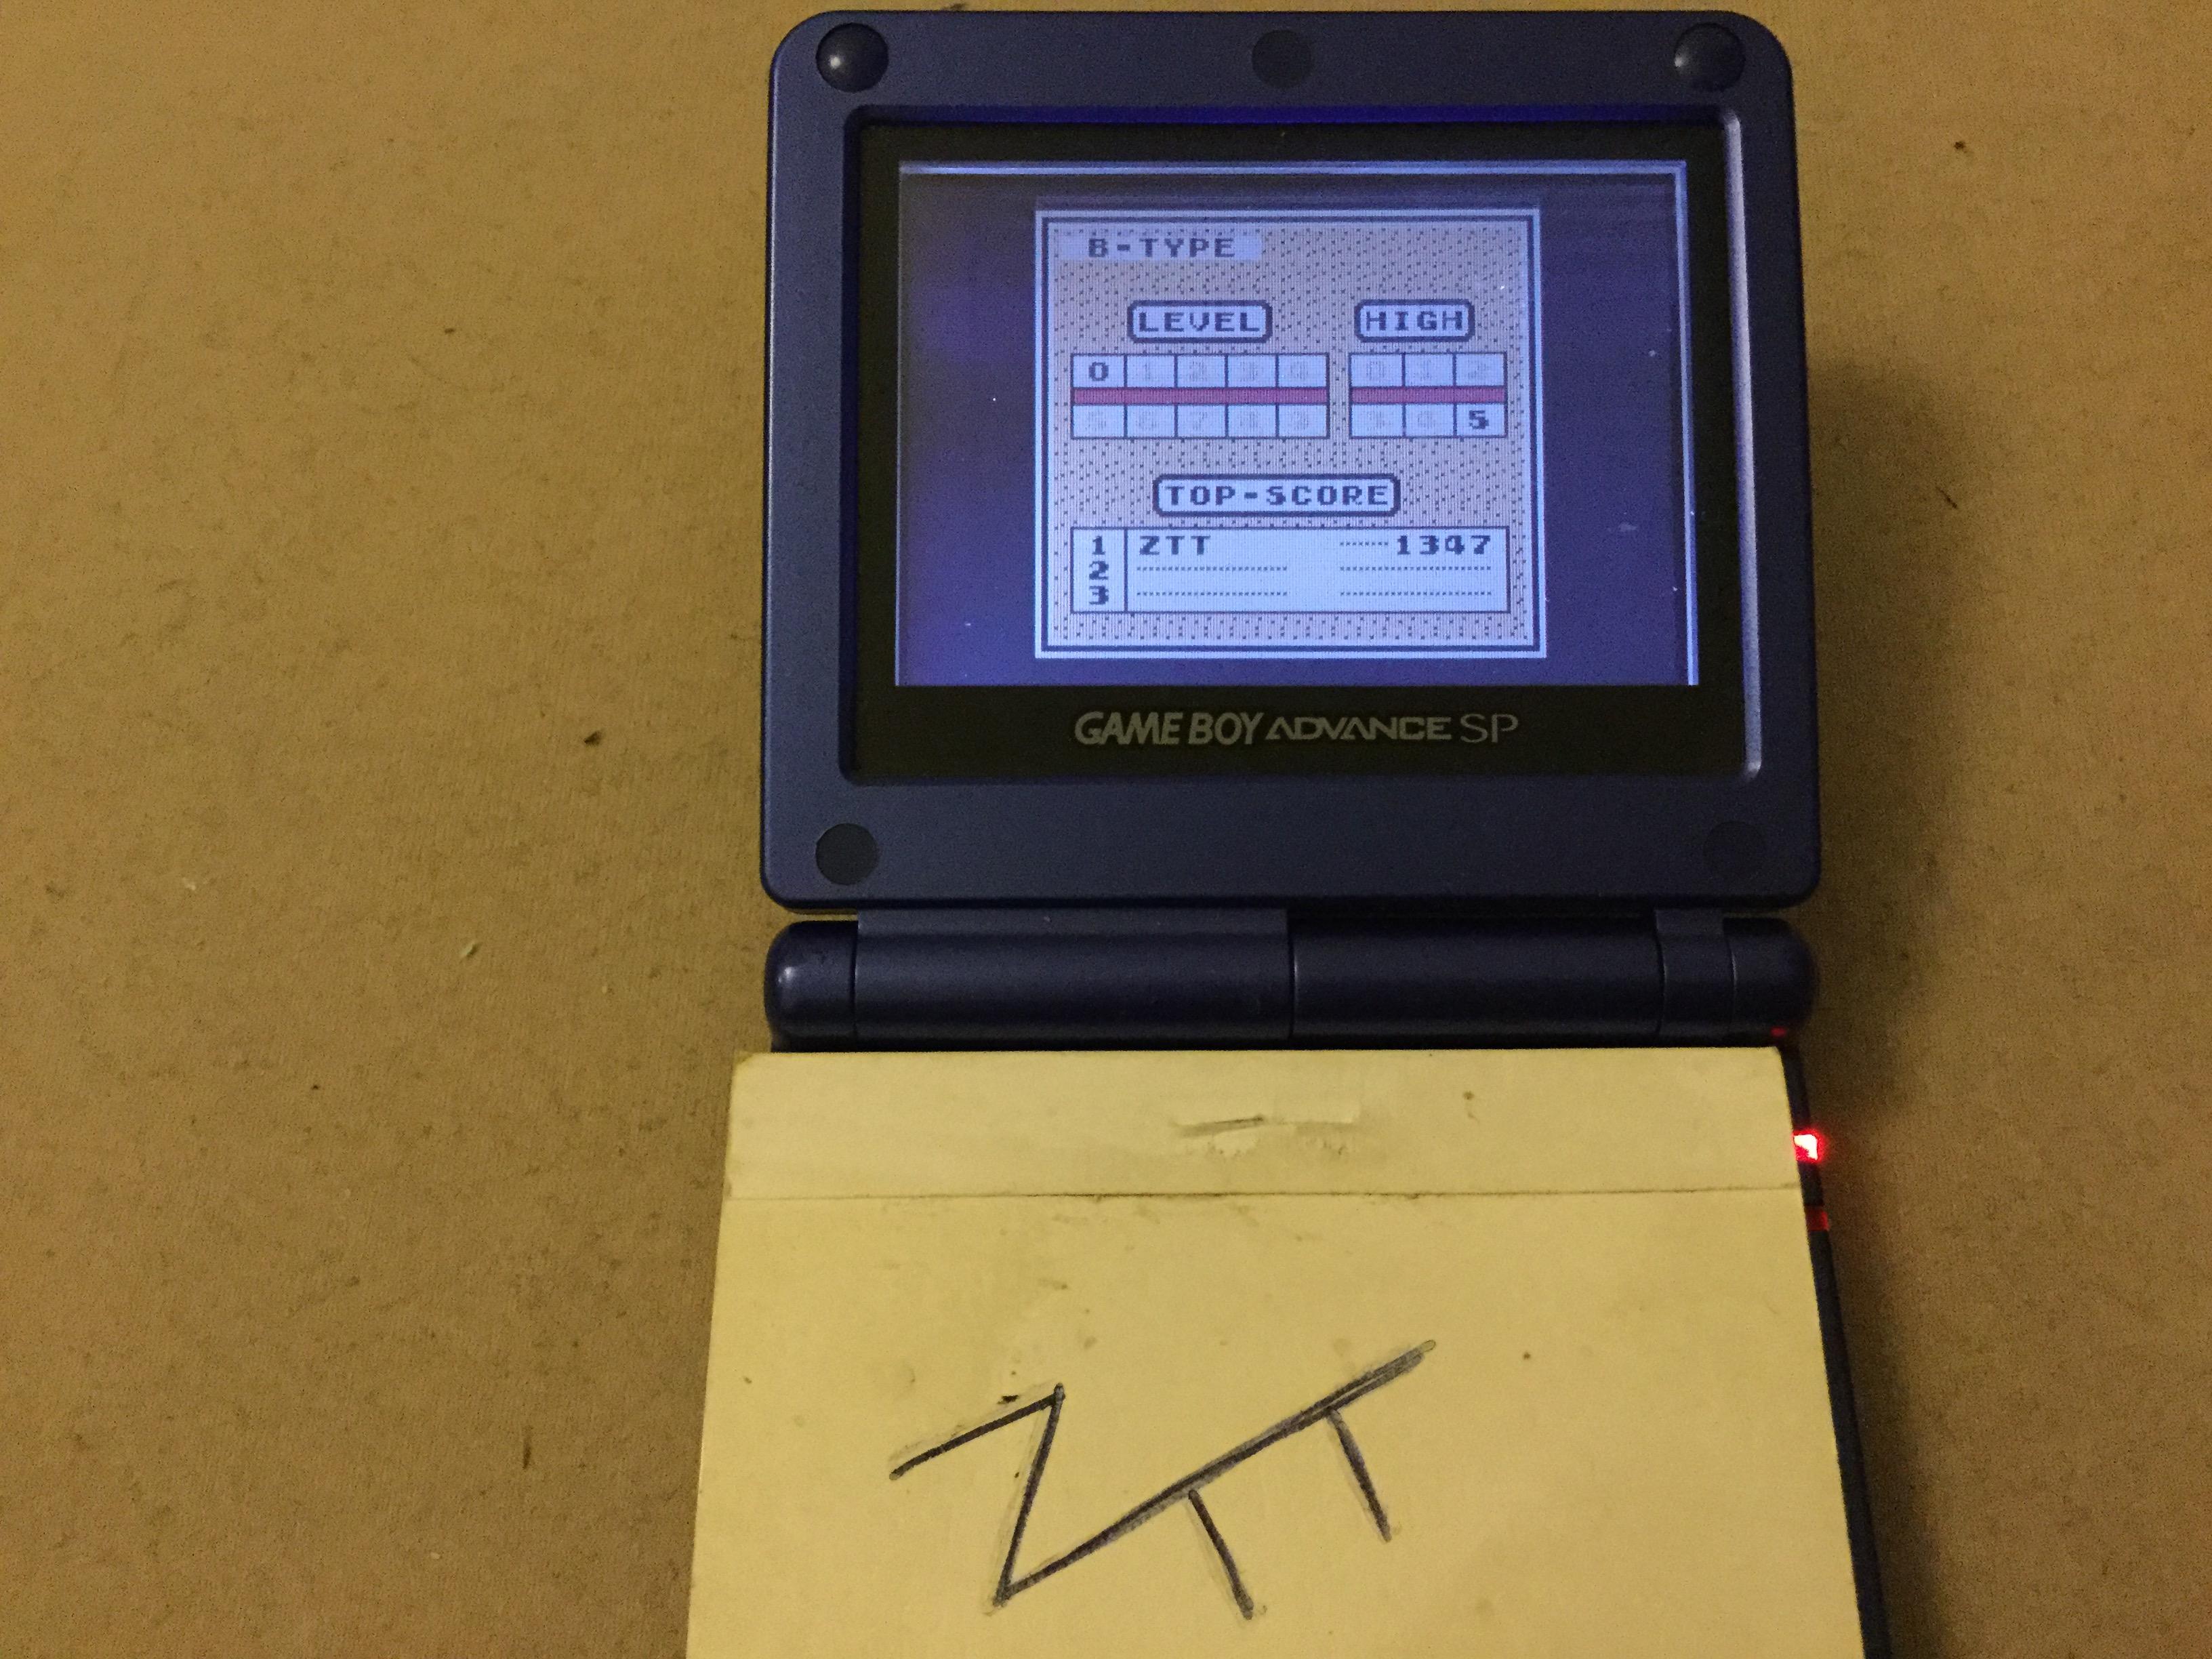 Frankie: Tetris: Type B [Level 0 / High 5] (Game Boy) 1,347 points on 2019-11-13 12:25:27